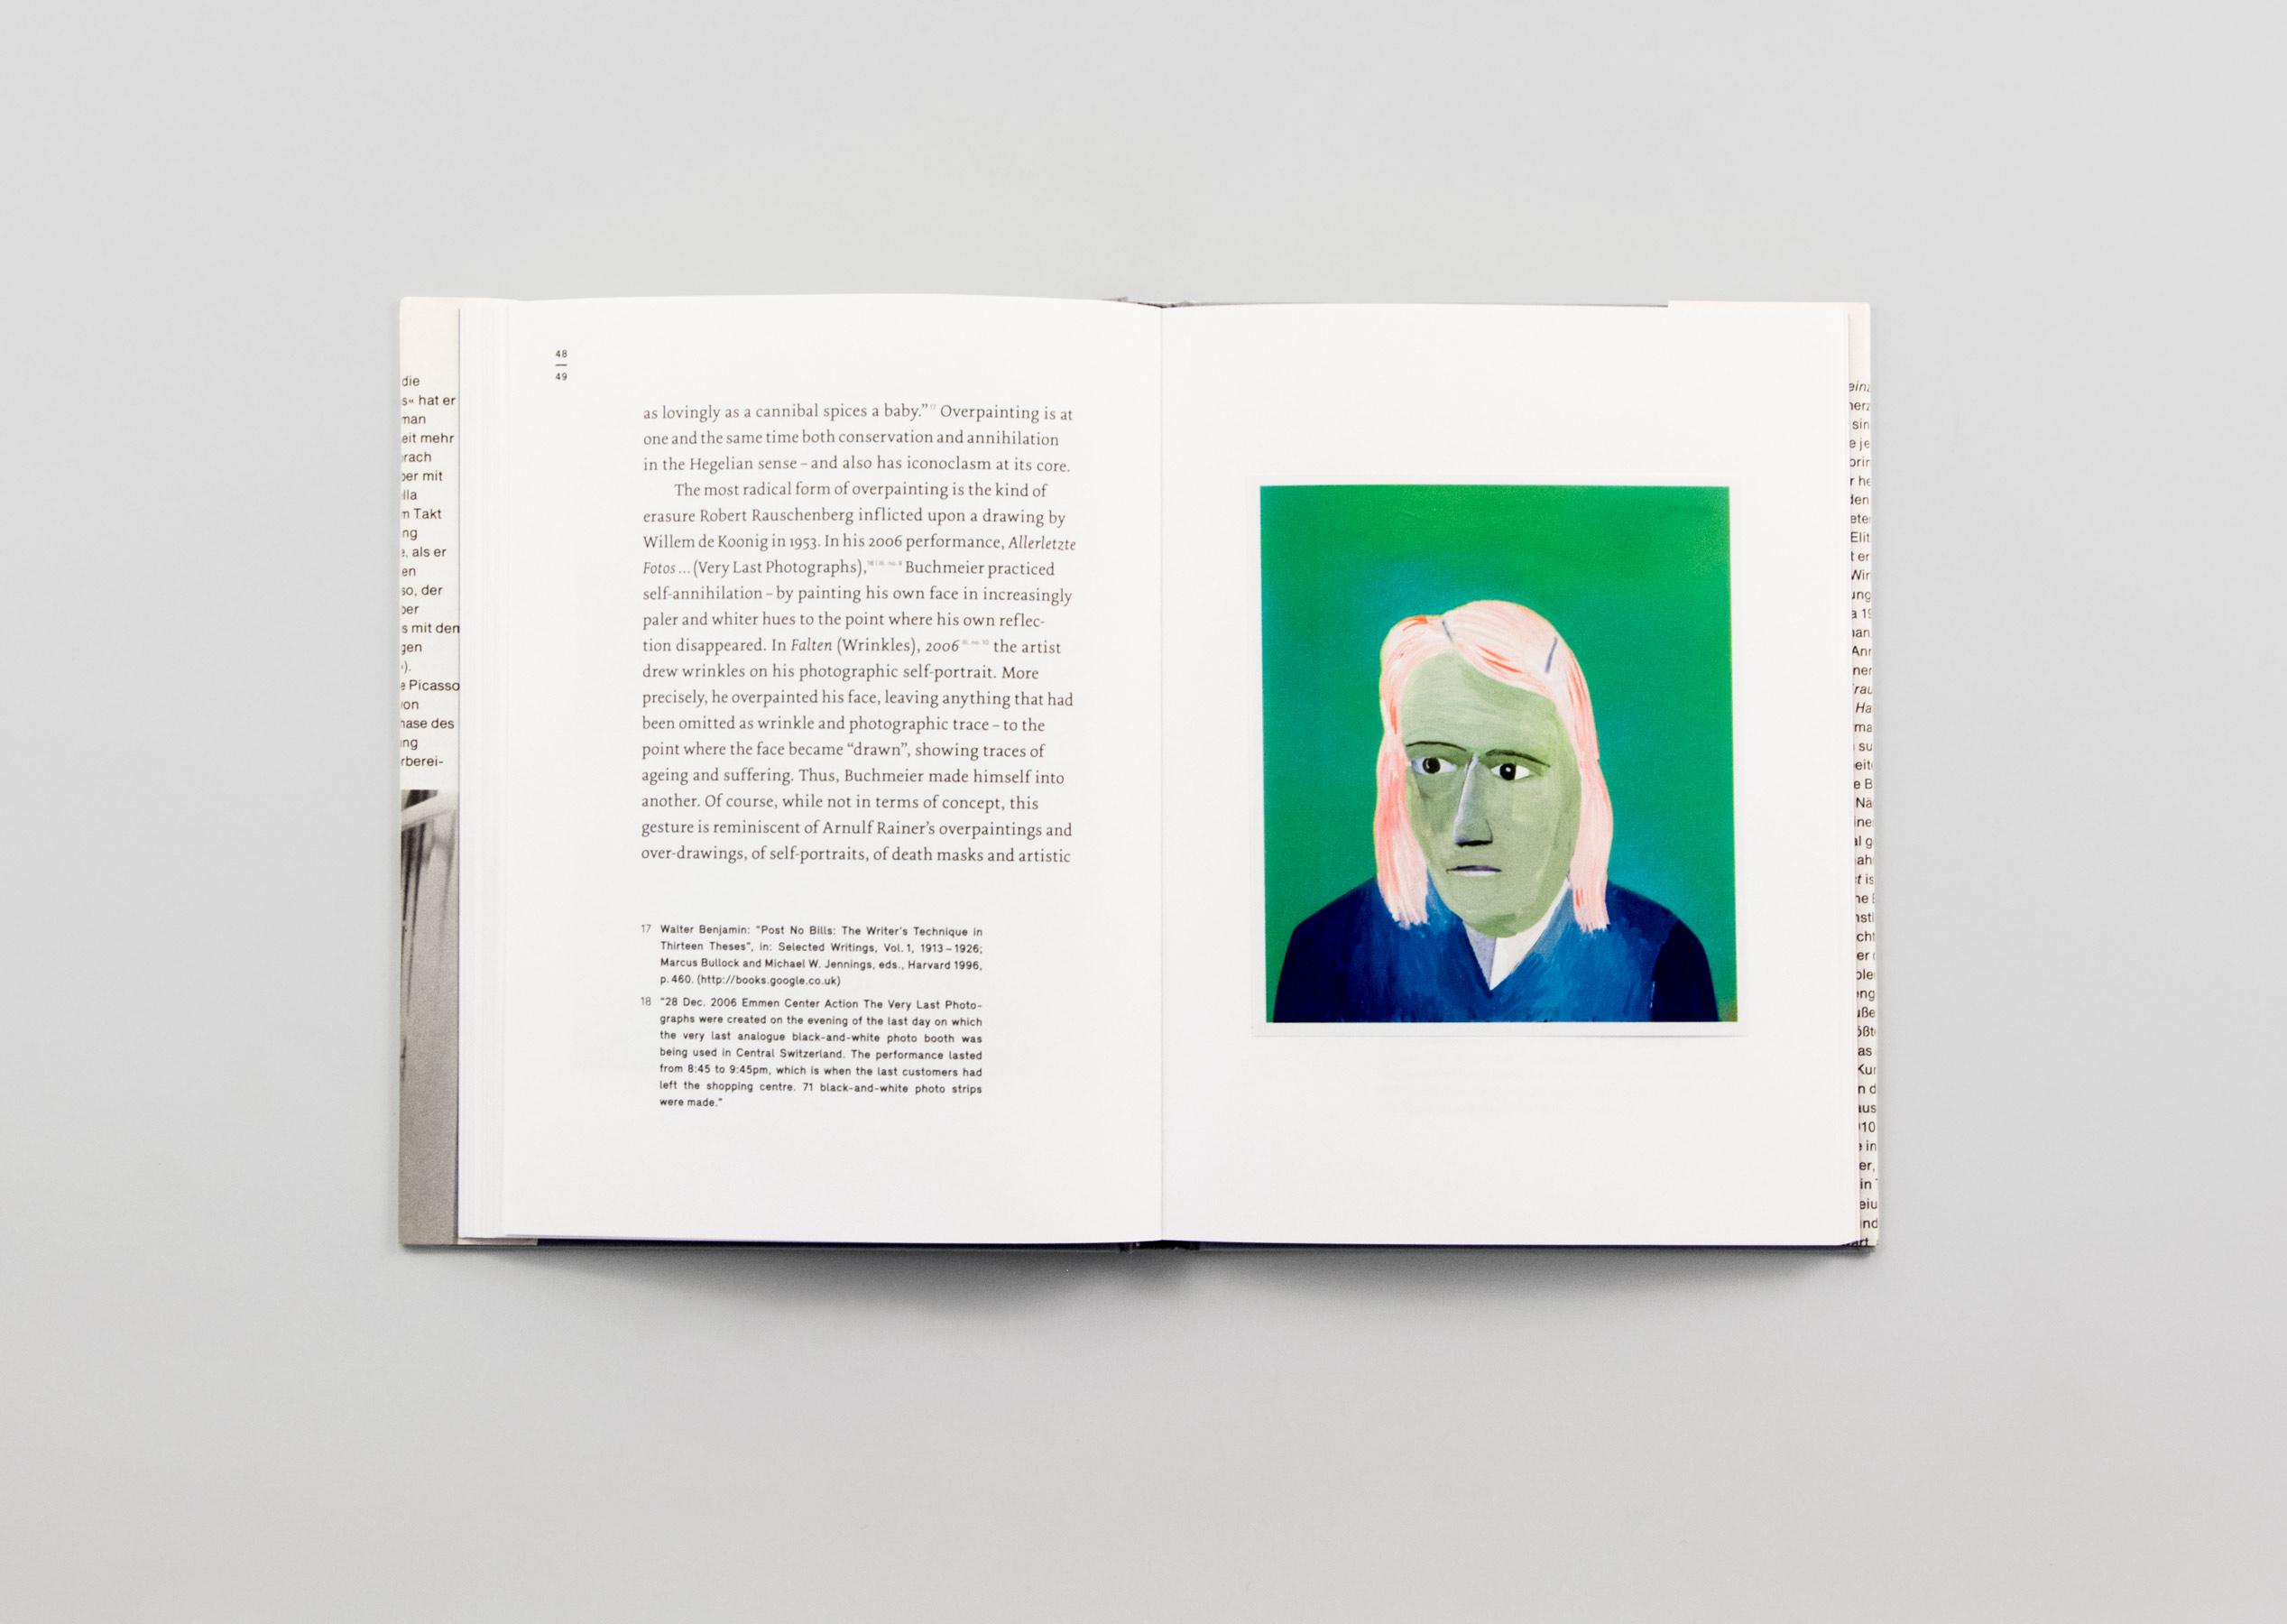 Edition Typoundso Postpicasso Hansjürg Buchmeier